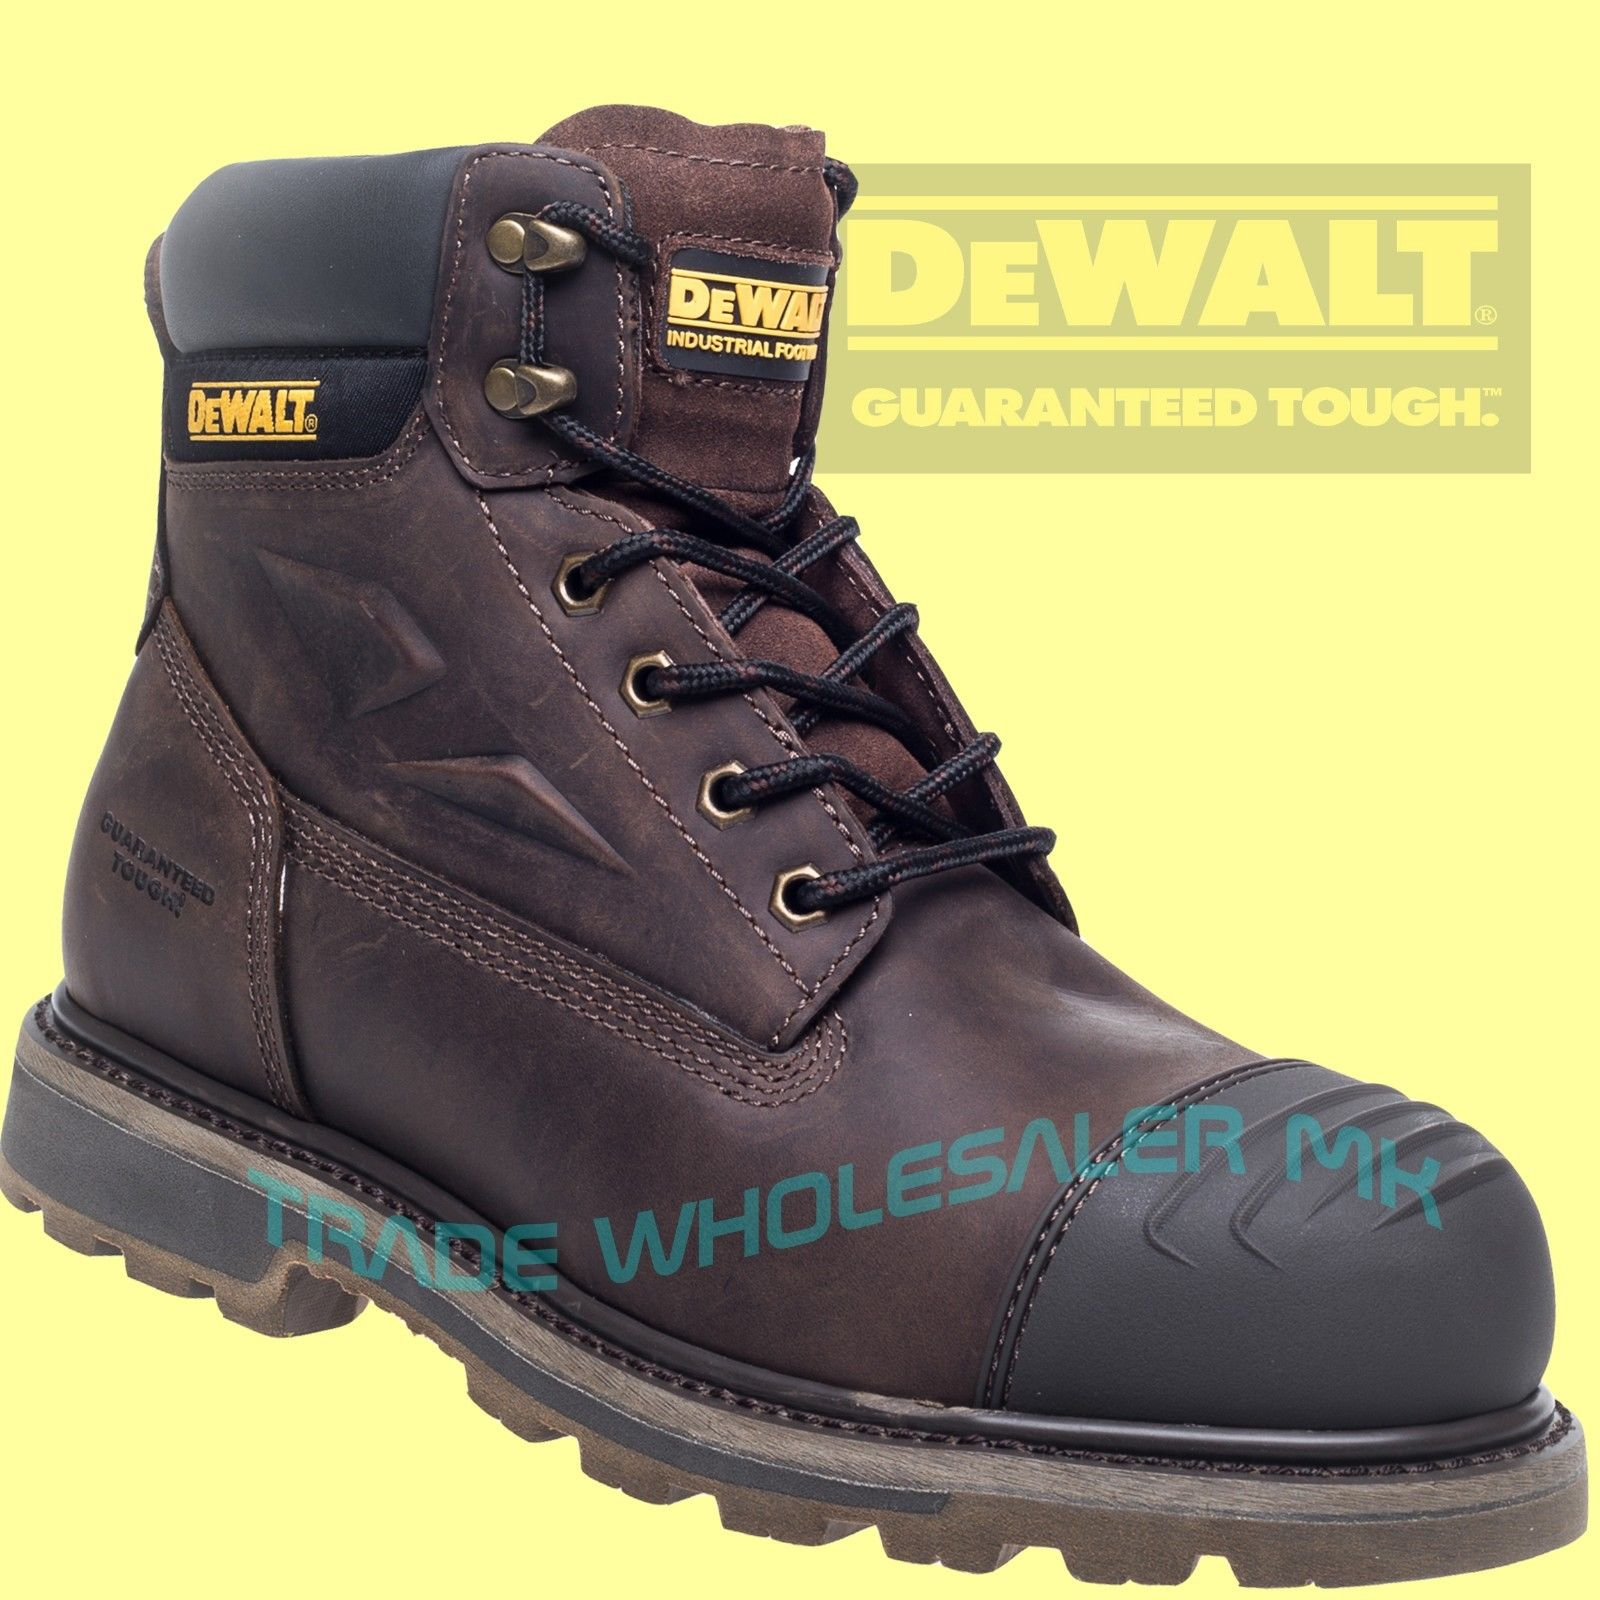 DeWalt Safety Boots Steel Toe Houston Work Boots UK sizes 5-13 ... e6f701453